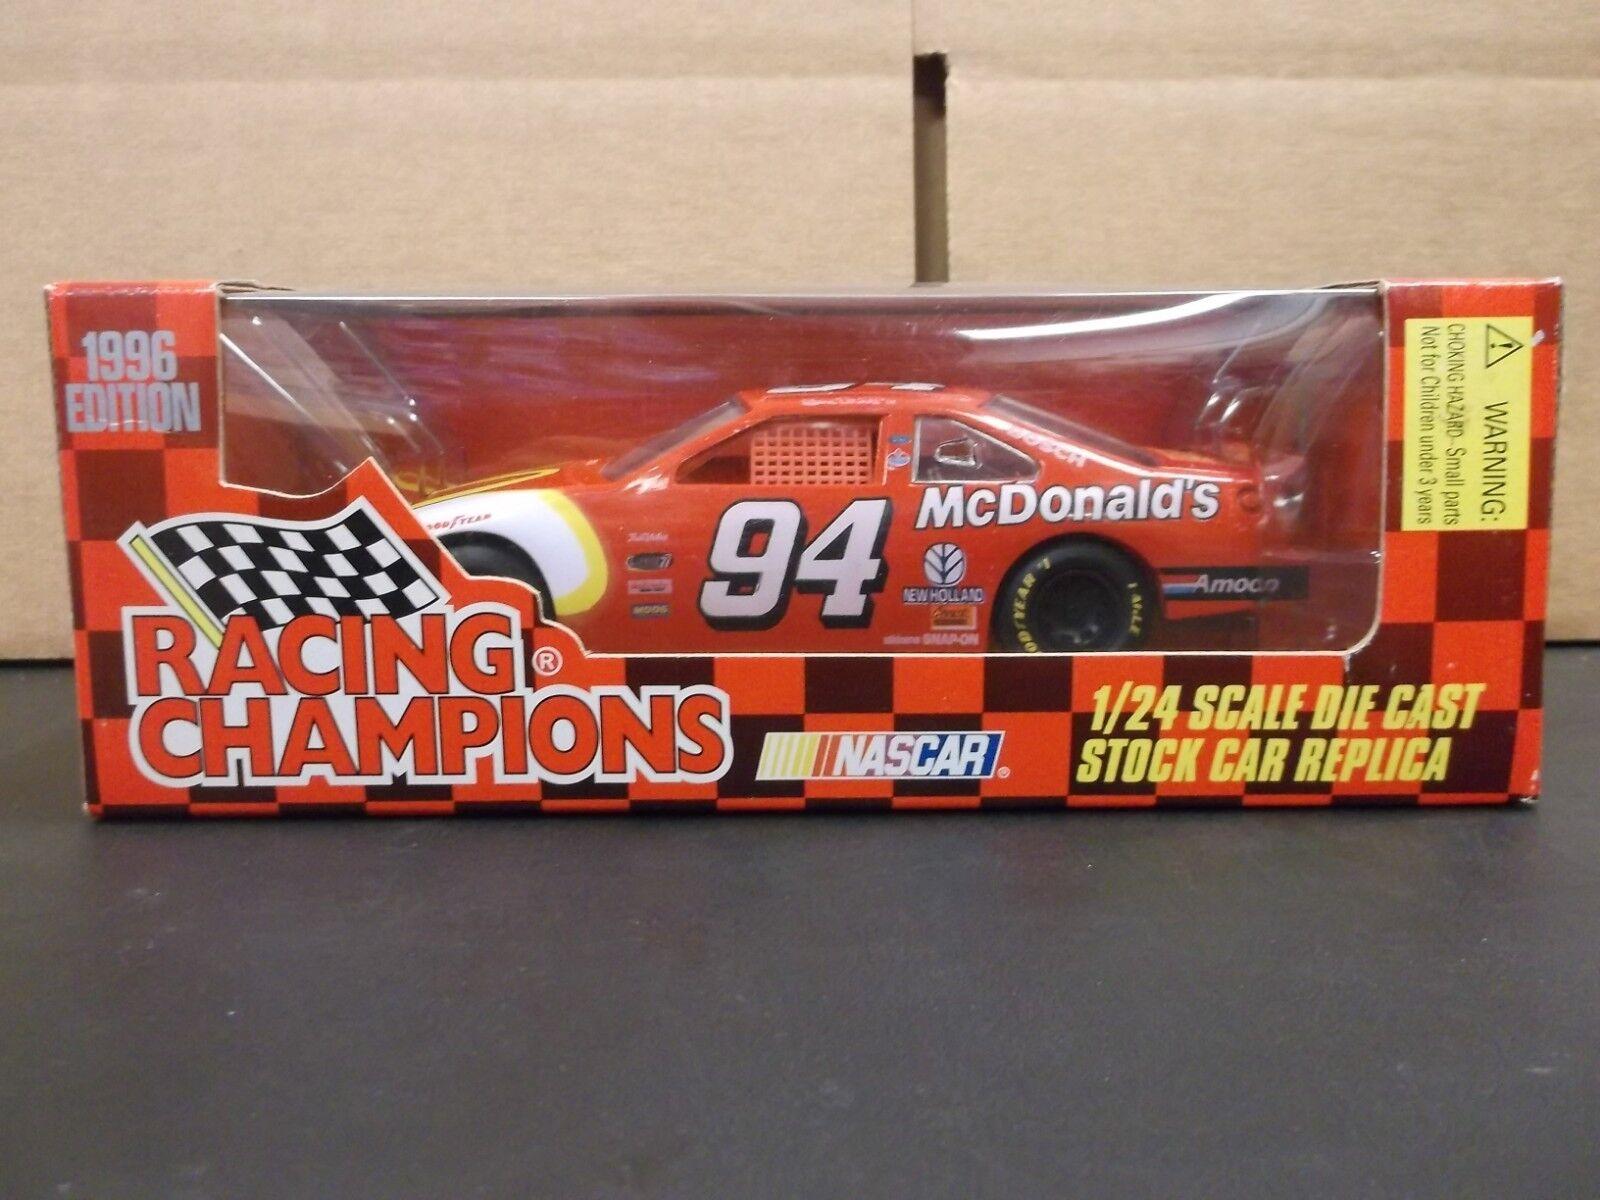 Racing Champions 1996 Edition NASCAR Bill Elliott McDonald's Ford 1 24 Scale